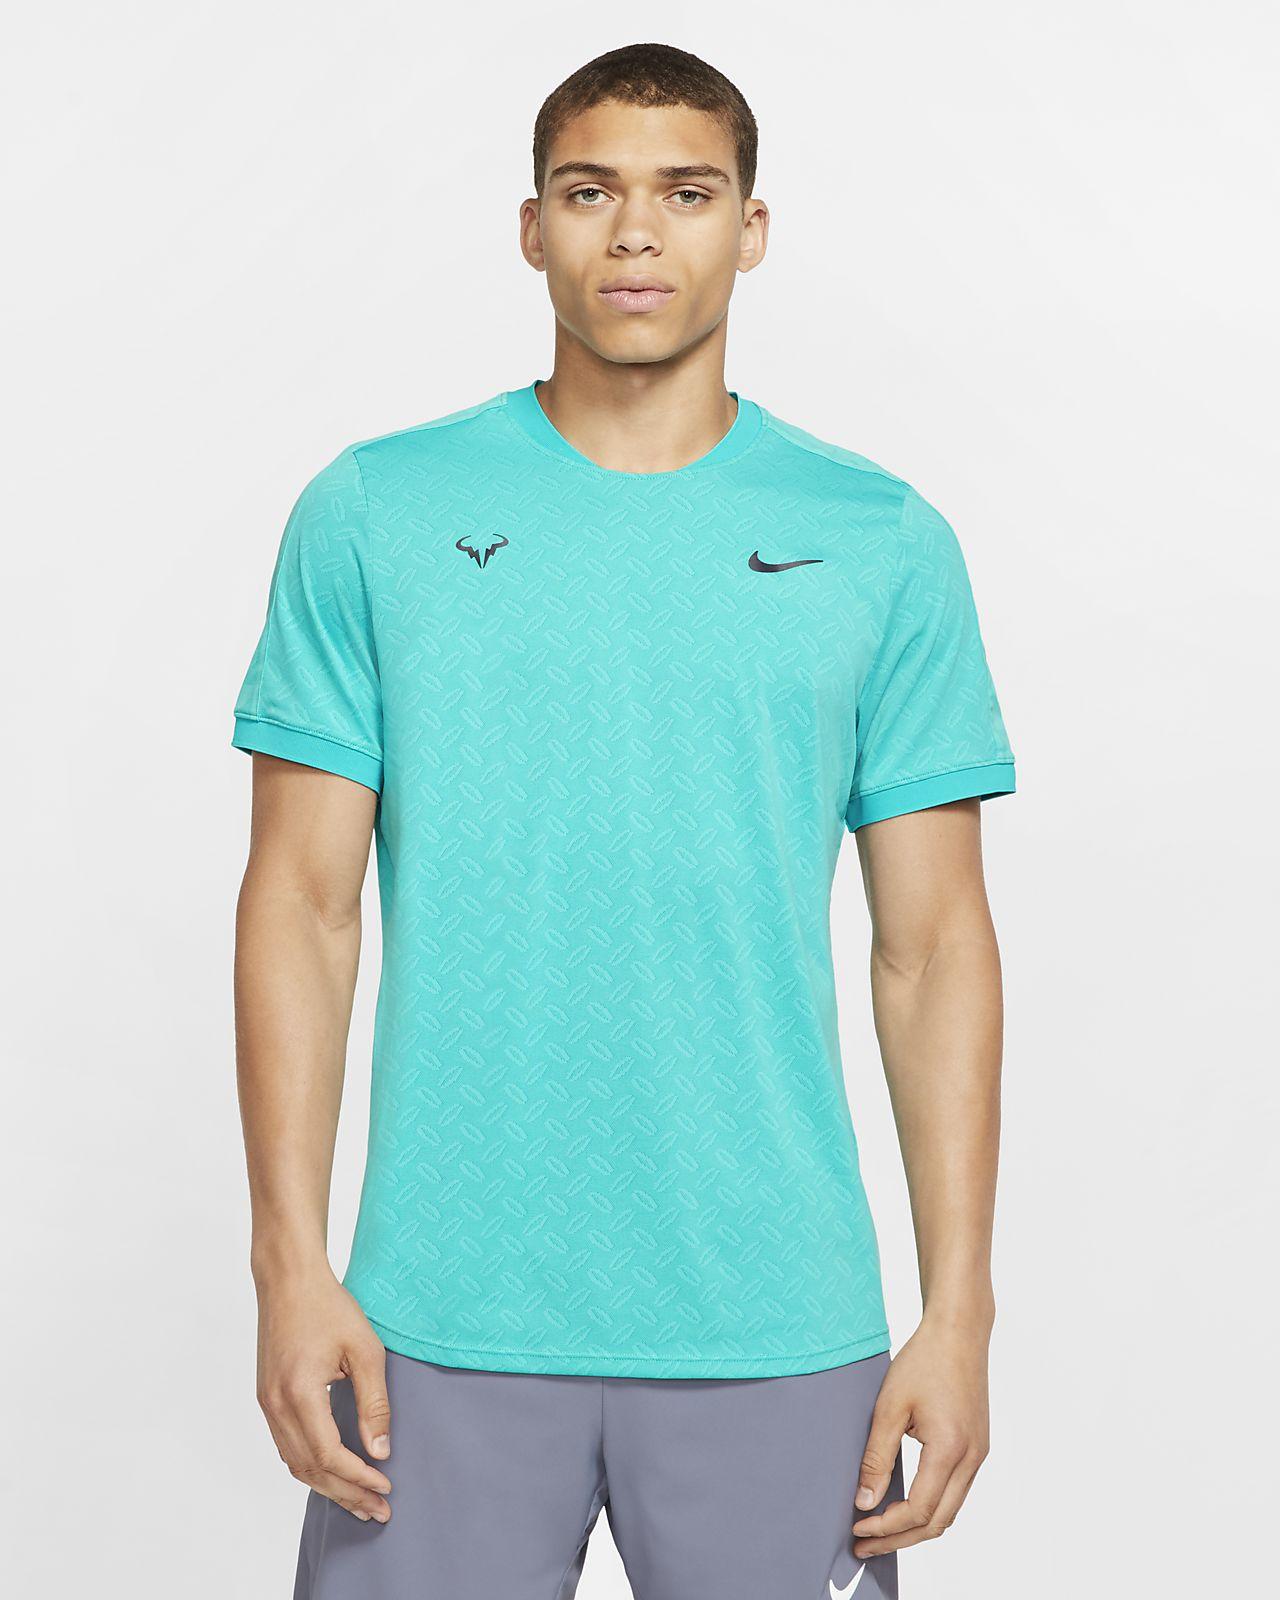 NikeCourt AeroReact Rafa Erkek Tenis Üstü